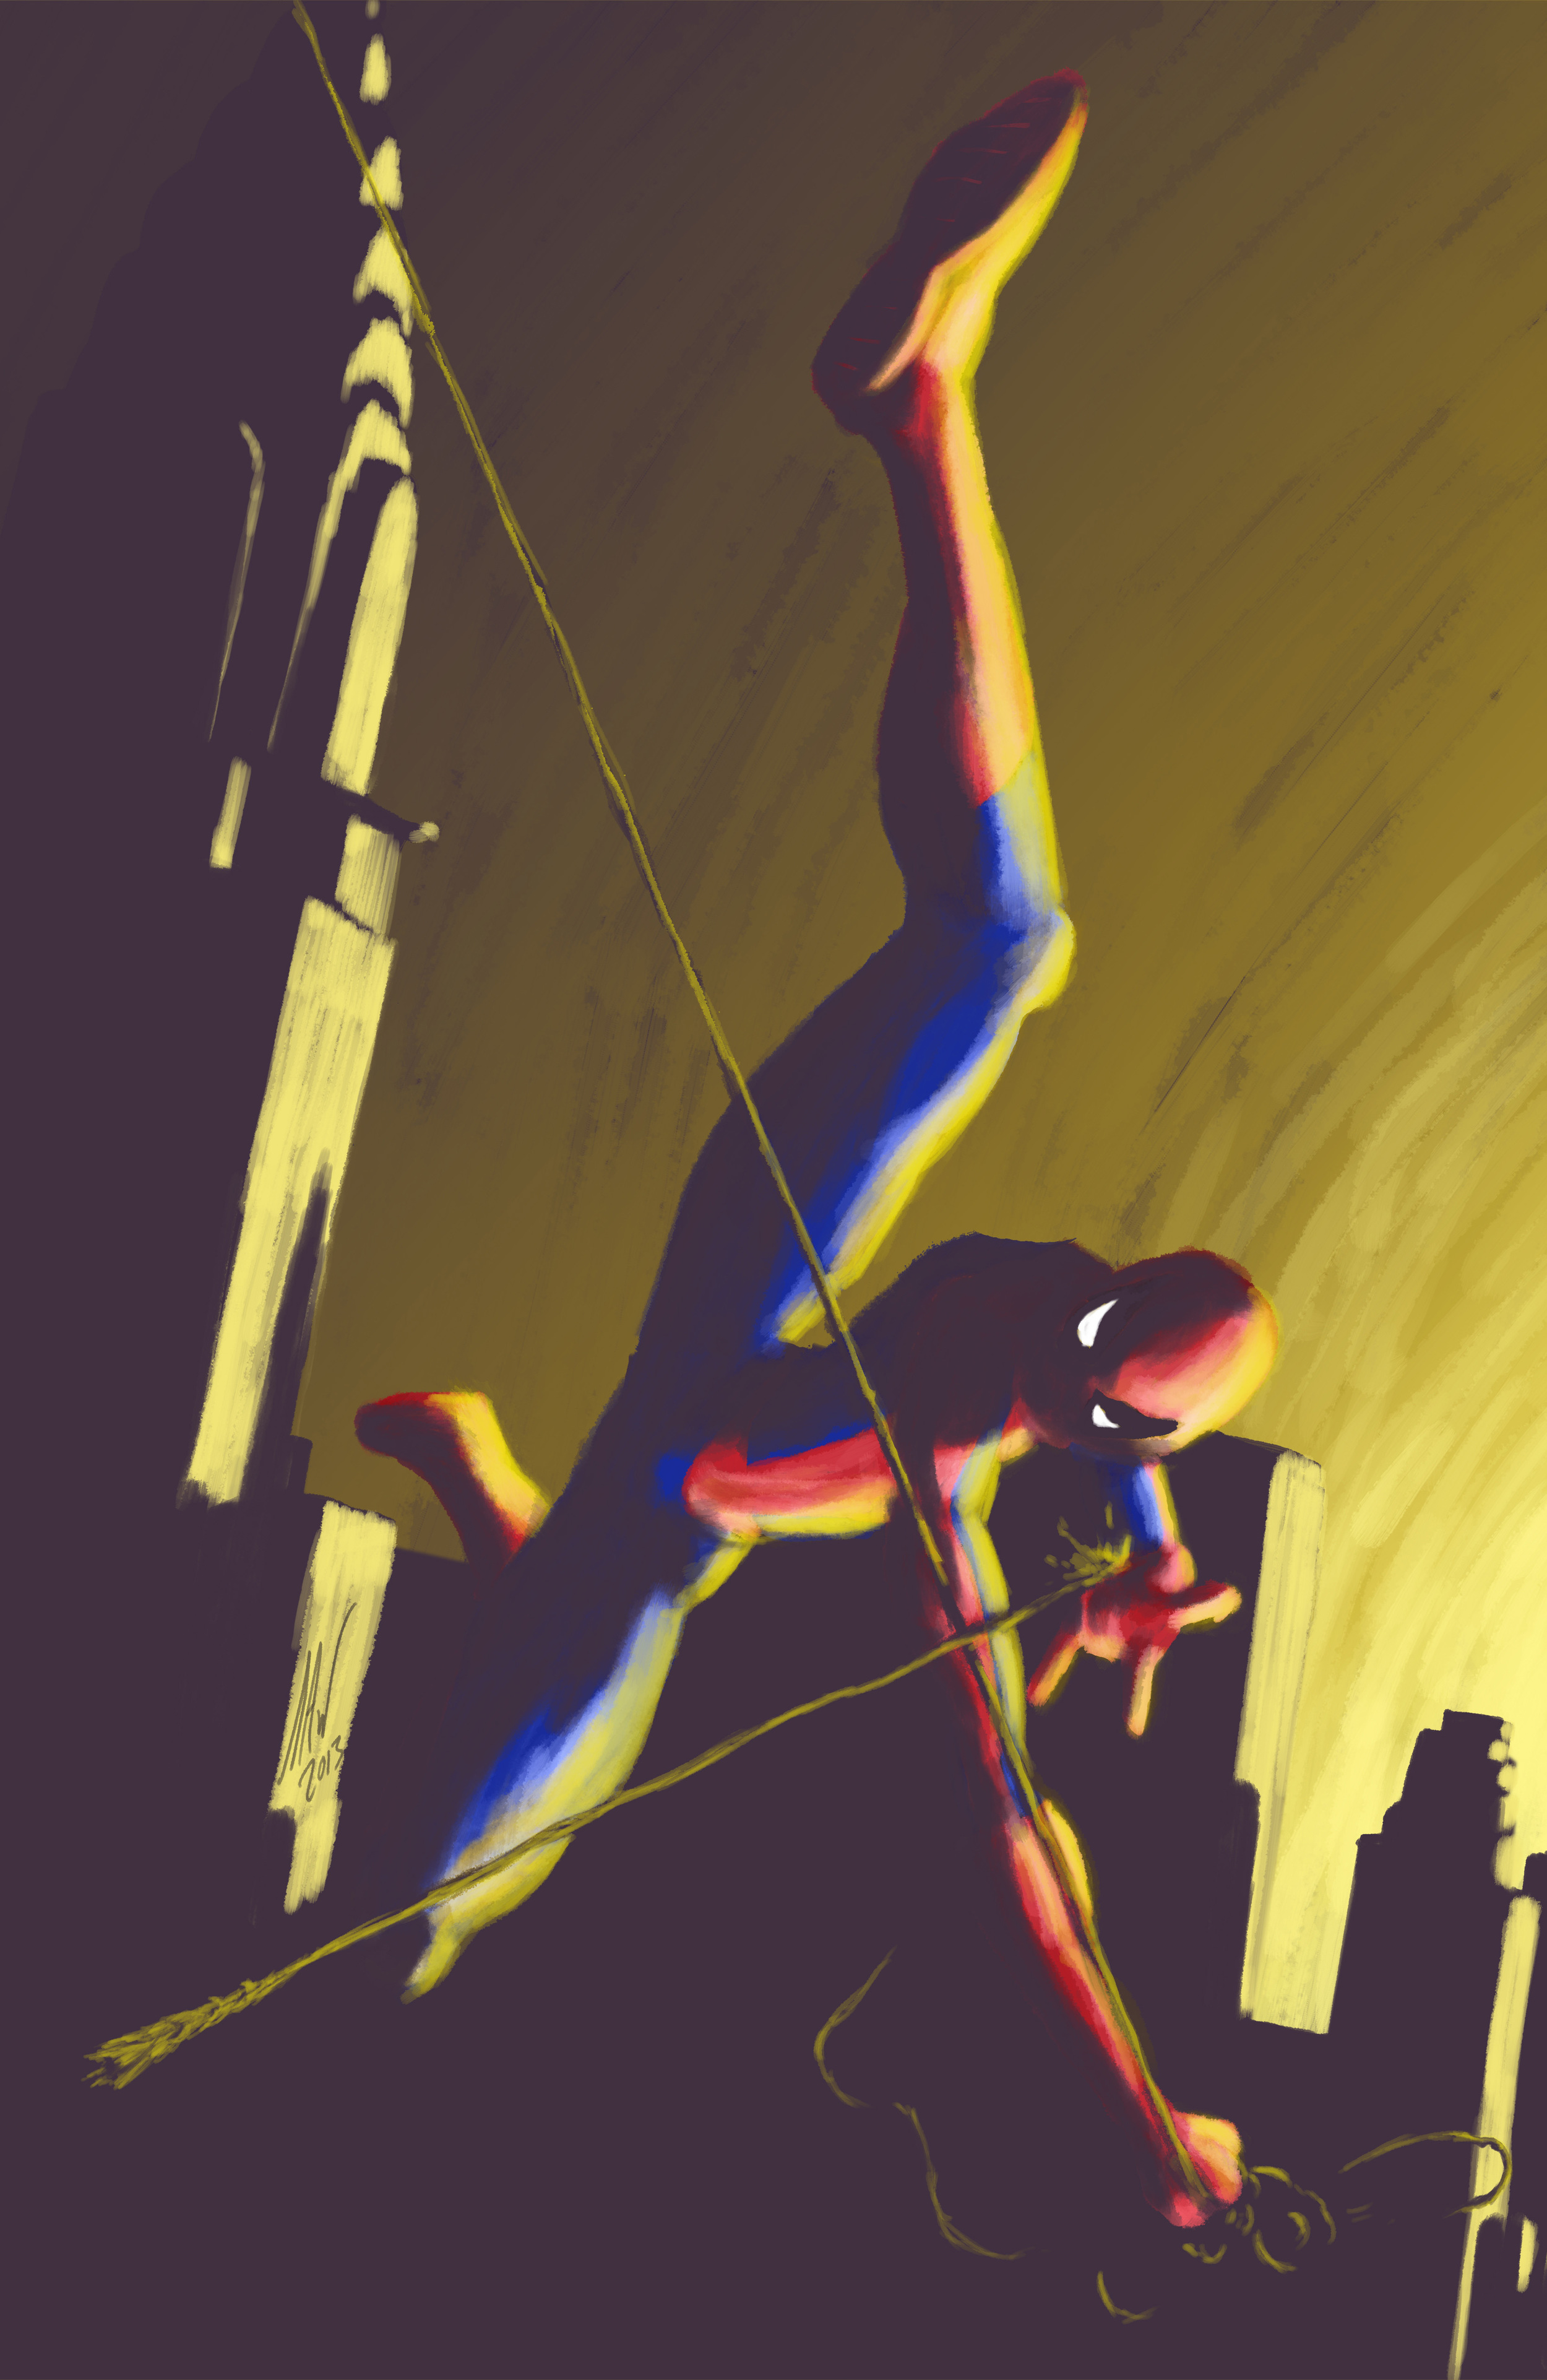 Spiderman-Swinging at Dawn 11x17.jpg